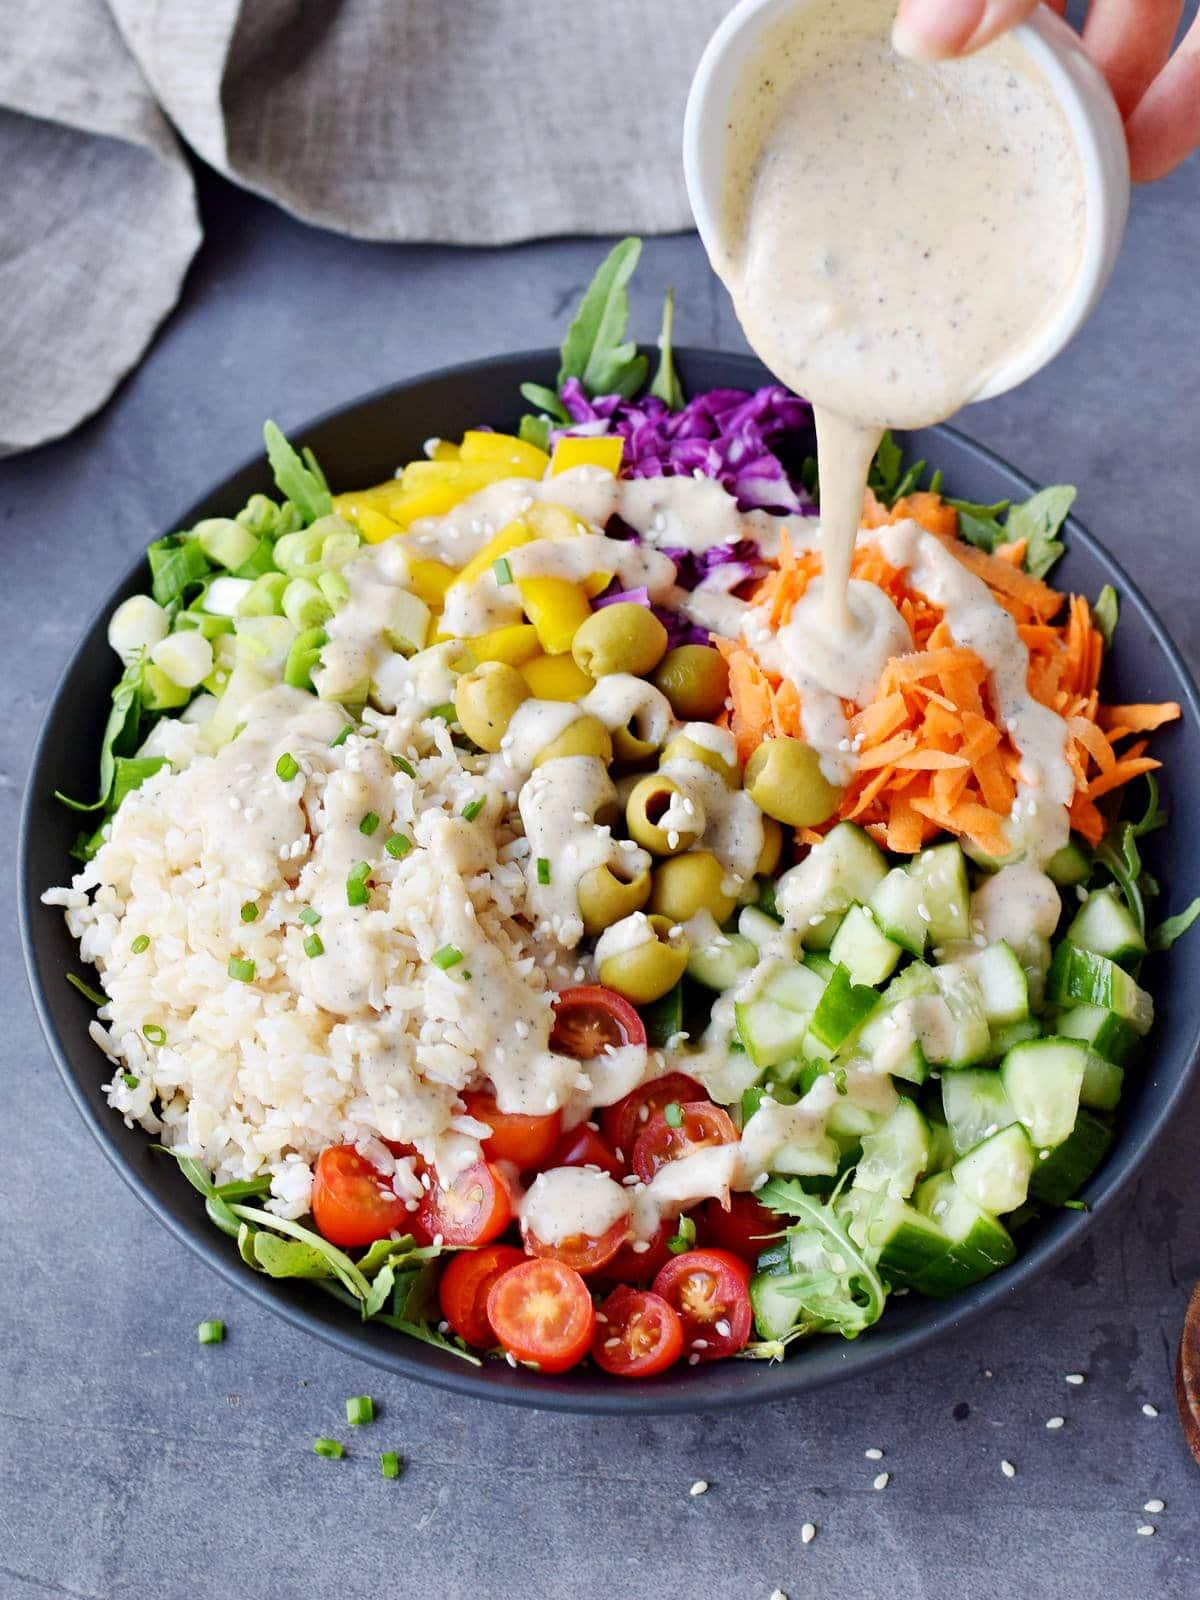 mediterraner Reissalat mit veganem Dressing